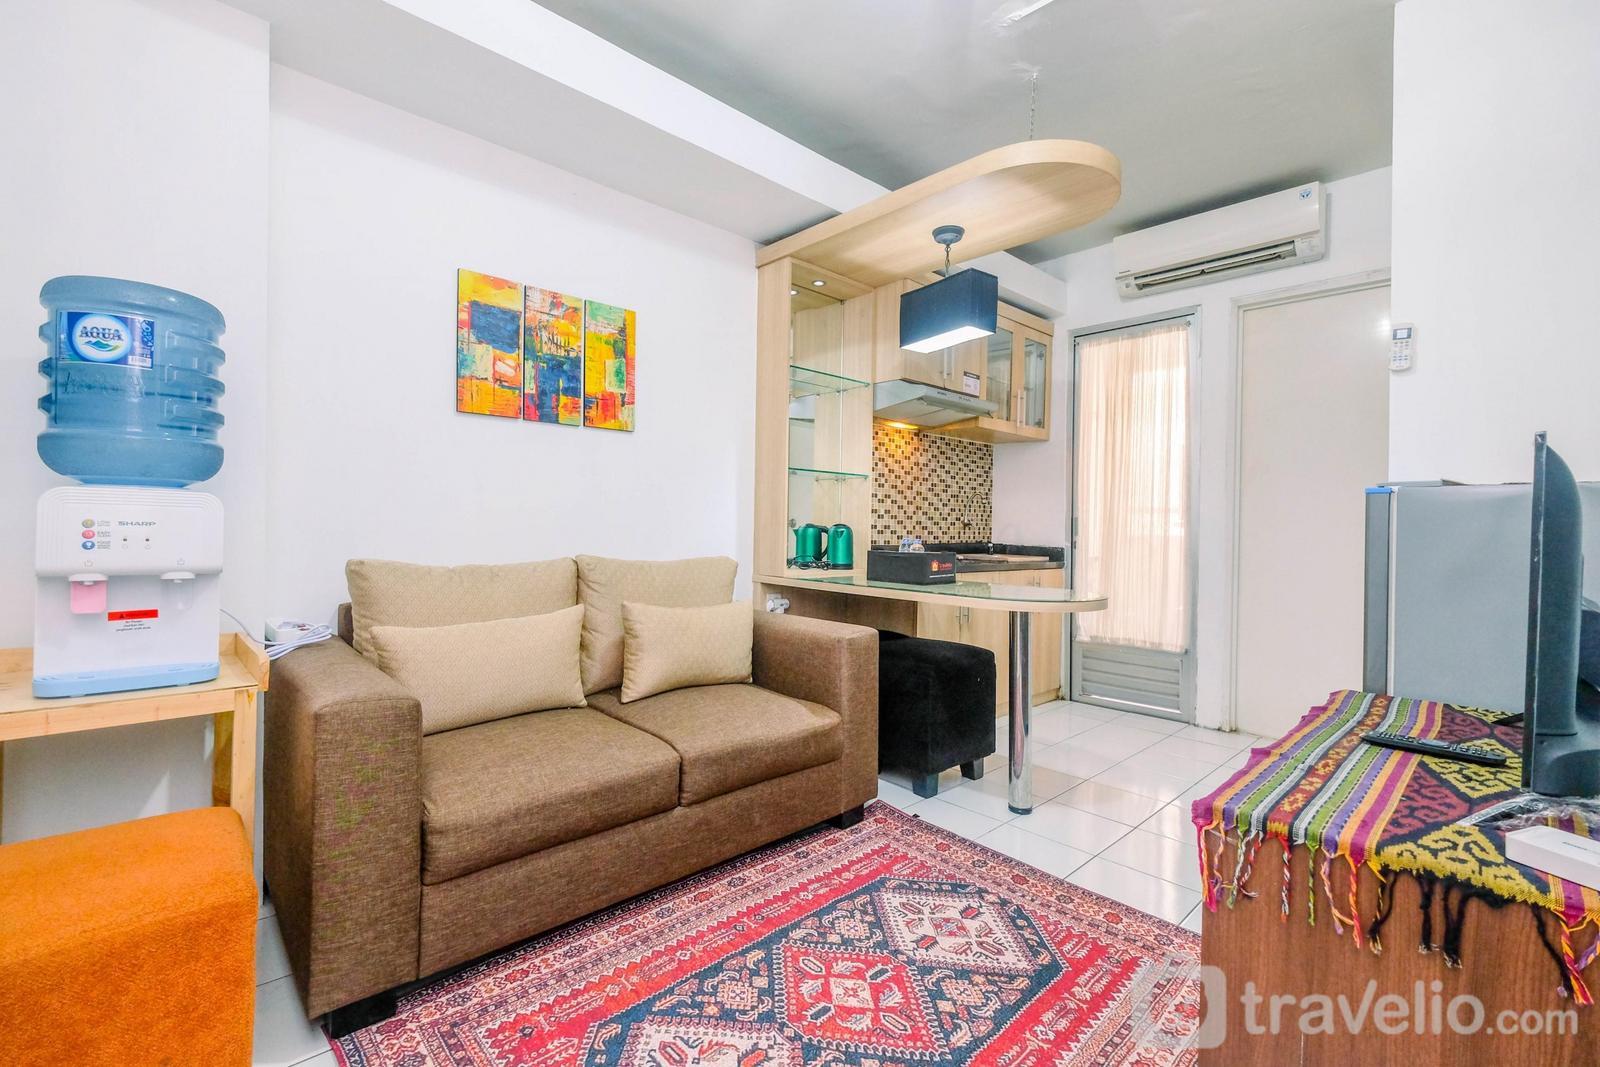 Kalibata City Apartment - Good Location 2BR Apartment Kalibata City near Mall By Travelio